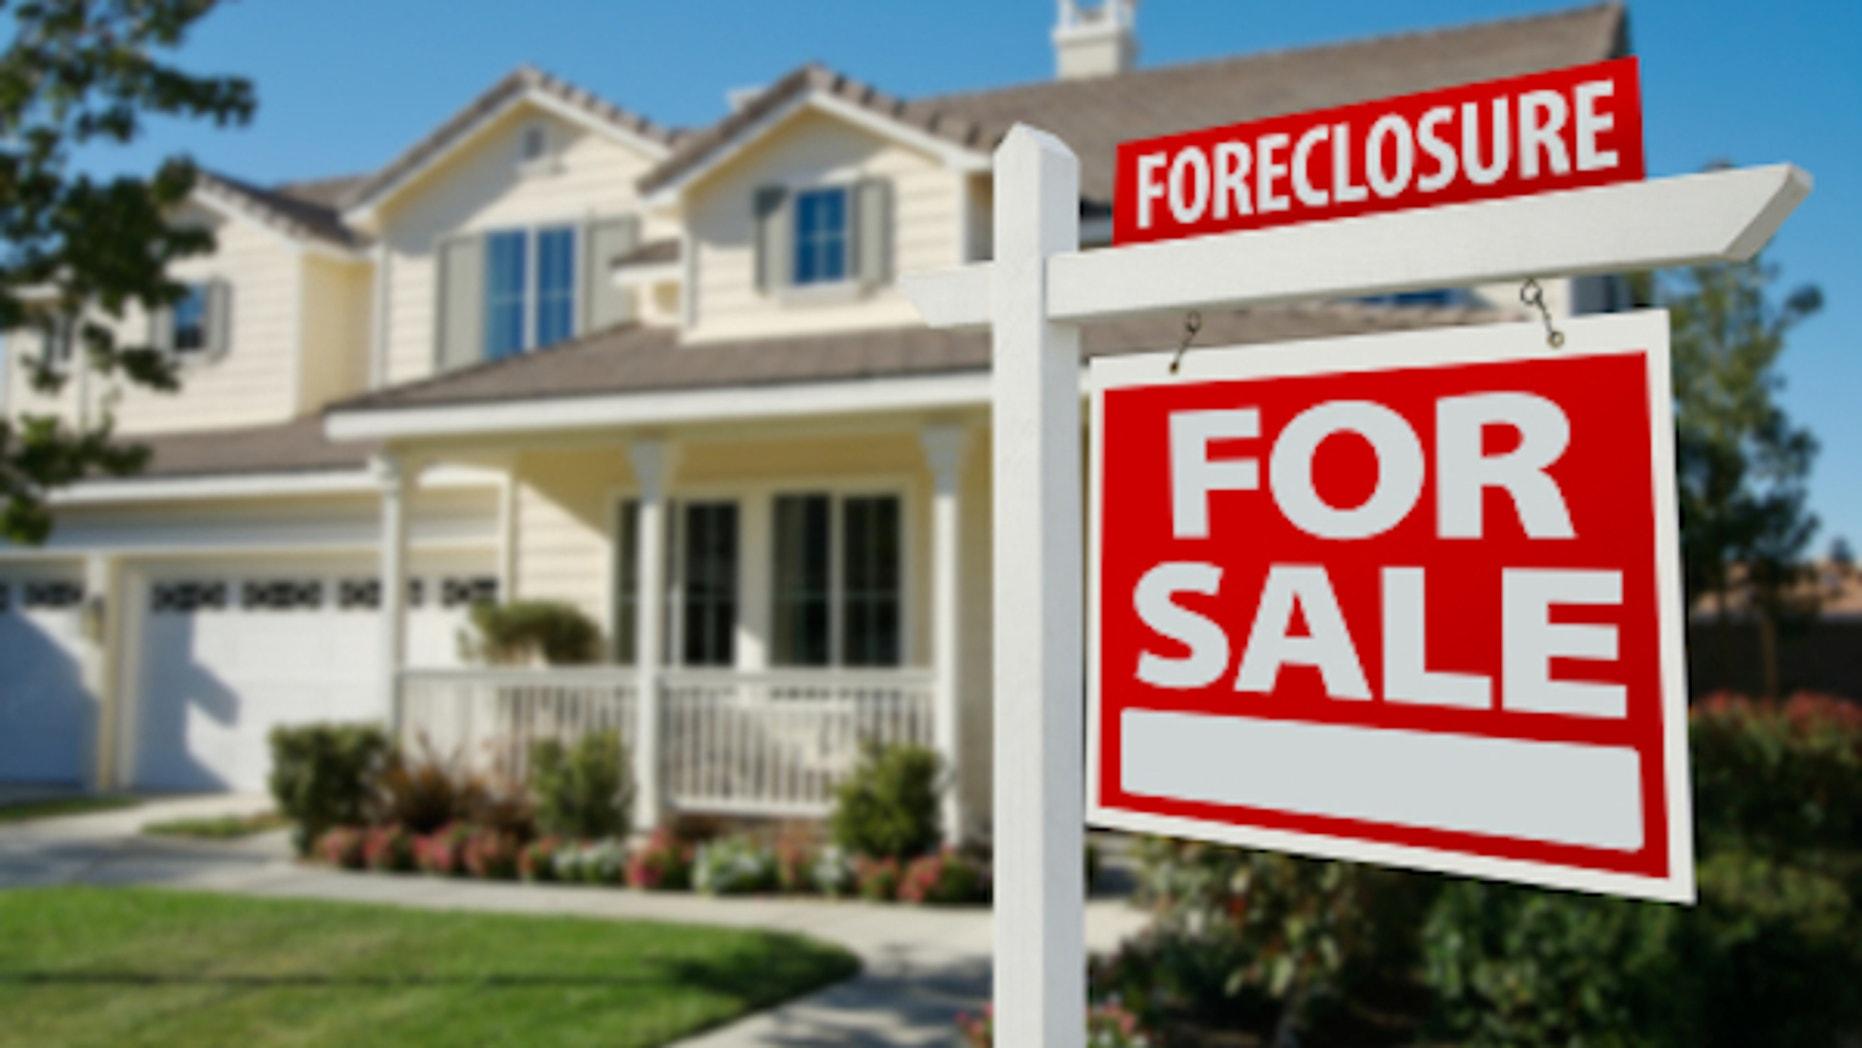 Predictions - Foreclosure